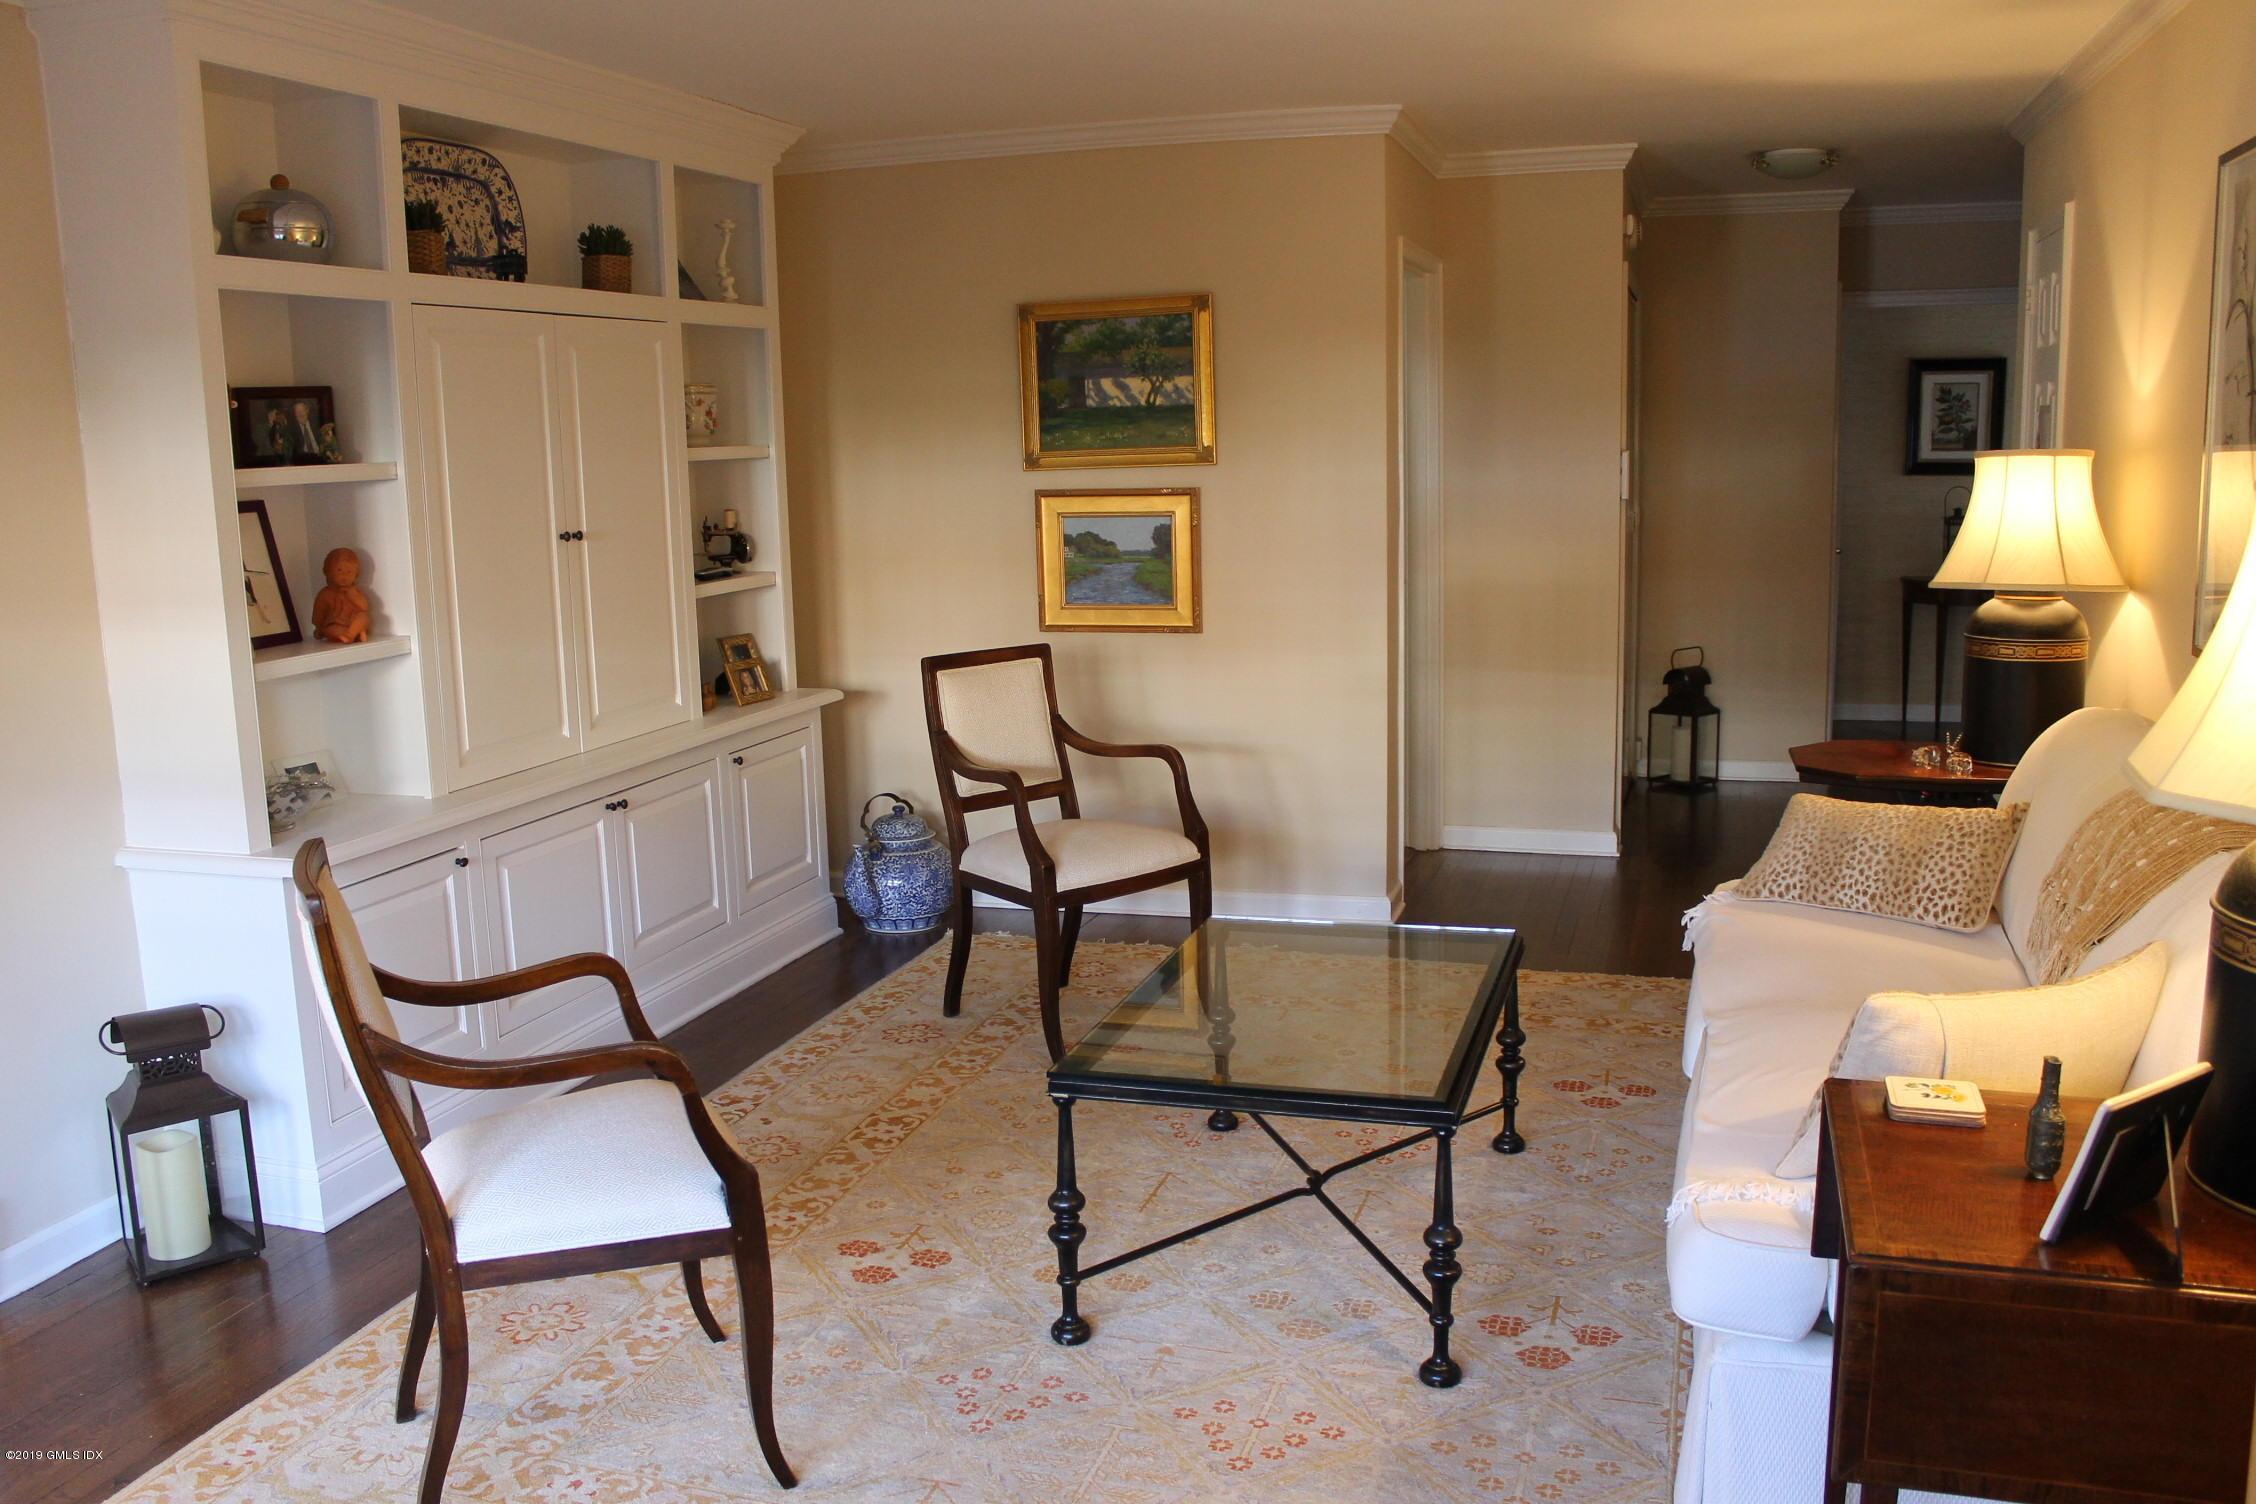 124 Putnam Park Greenwich,Connecticut 06830,1 Bedroom Bedrooms,1 BathroomBathrooms,Co-op,Putnam Park,105382